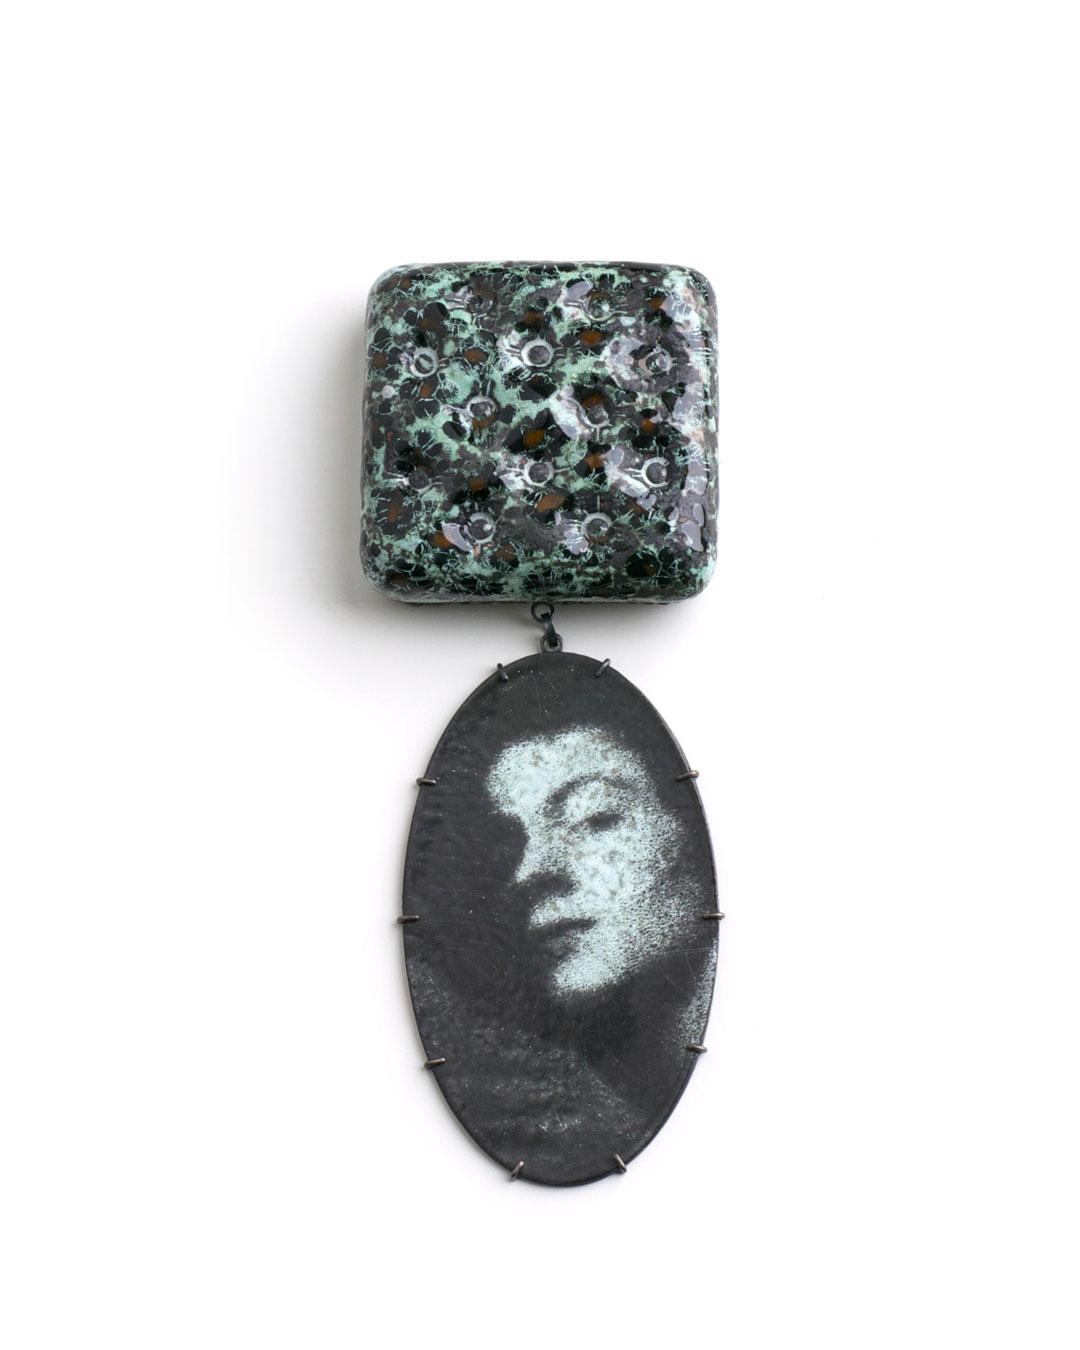 Vera Siemund, untitled, 2008, brooch; copper, silver, enamel, 60 x 160 x 20 mm, €1180